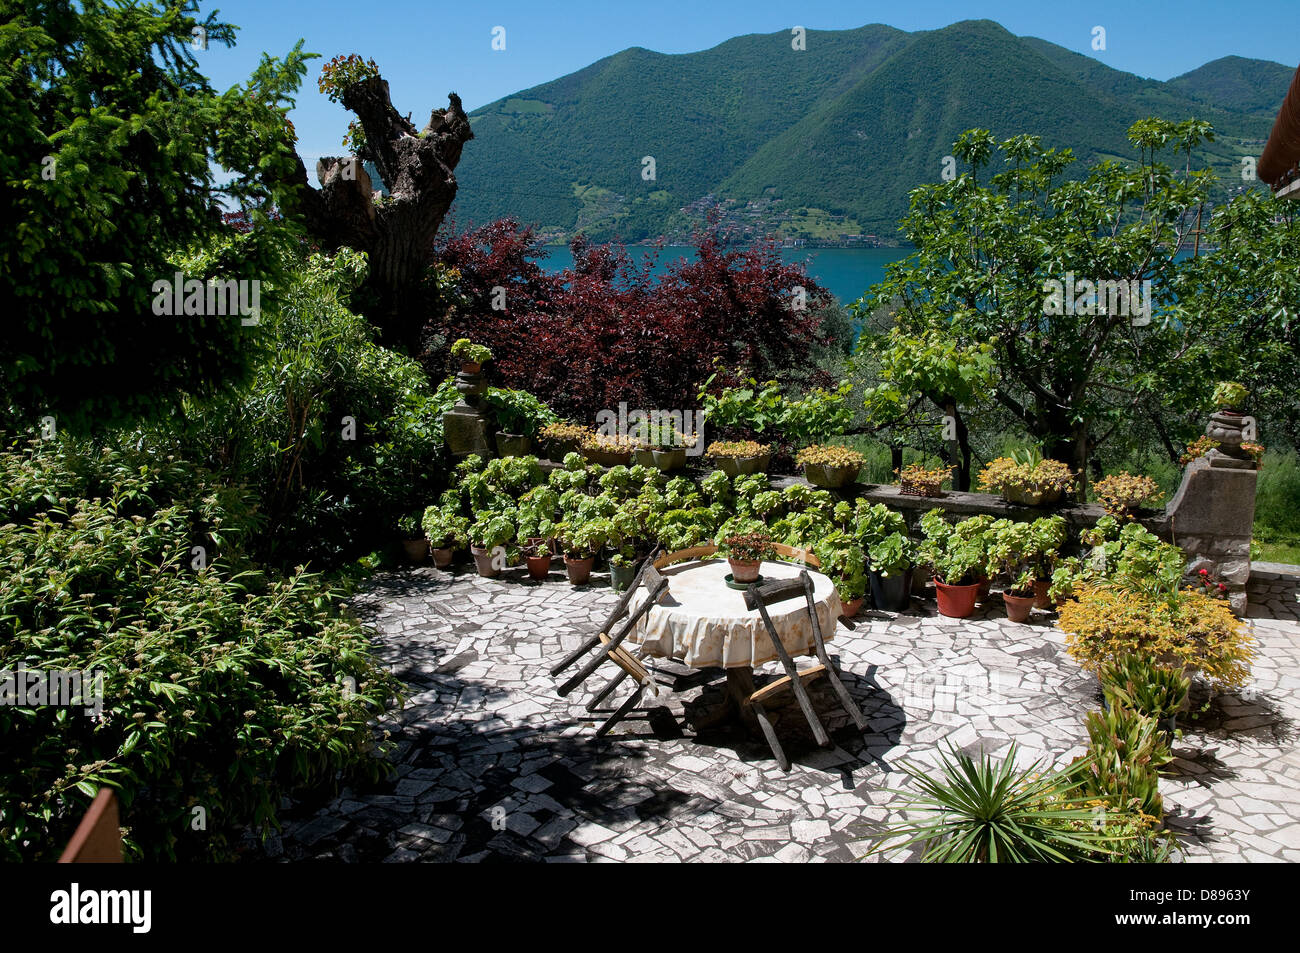 garden on monte isola, lake iseo, lombardy, italy - Stock Image